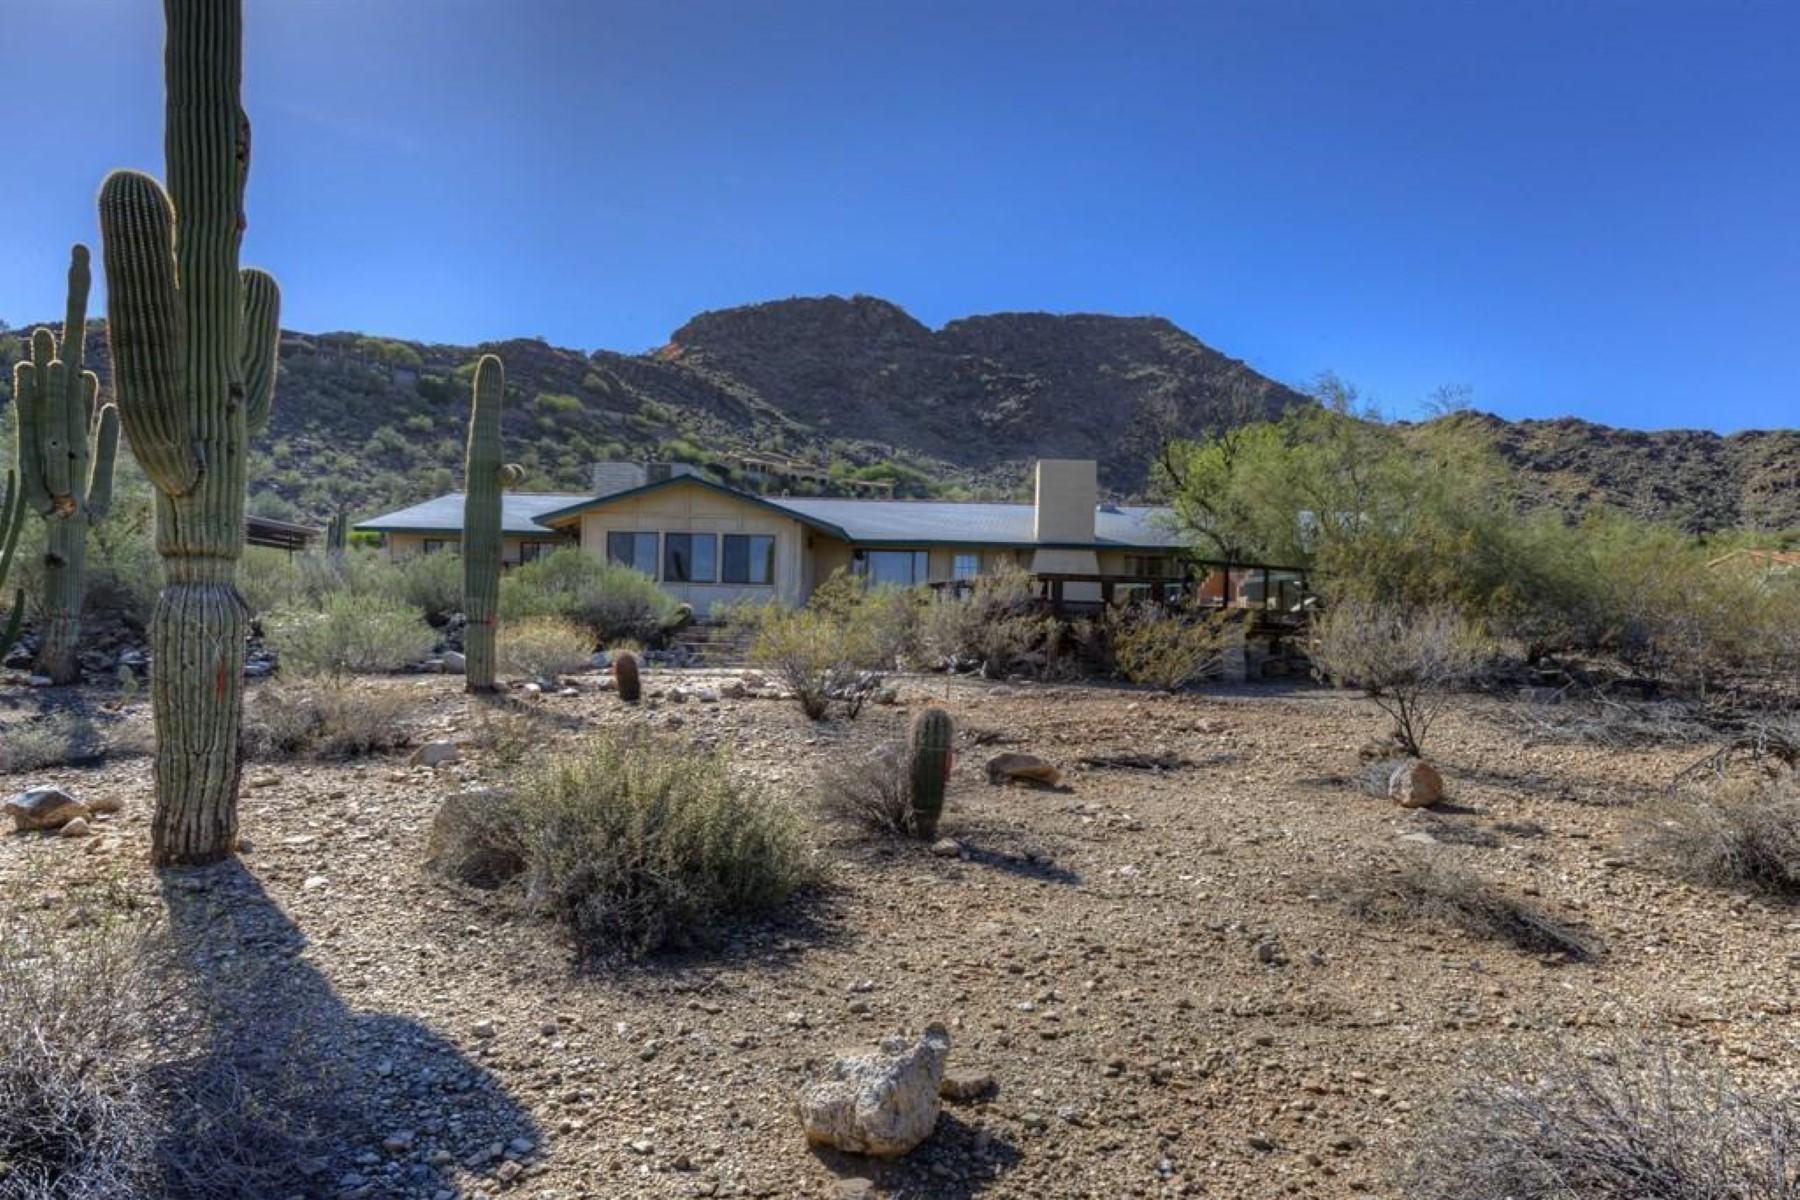 Arazi için Satış at Sweeping views from this 1.62 acre estate lot 5920 E Foothill Dr N #74 Paradise Valley, Arizona 85253 Amerika Birleşik Devletleri